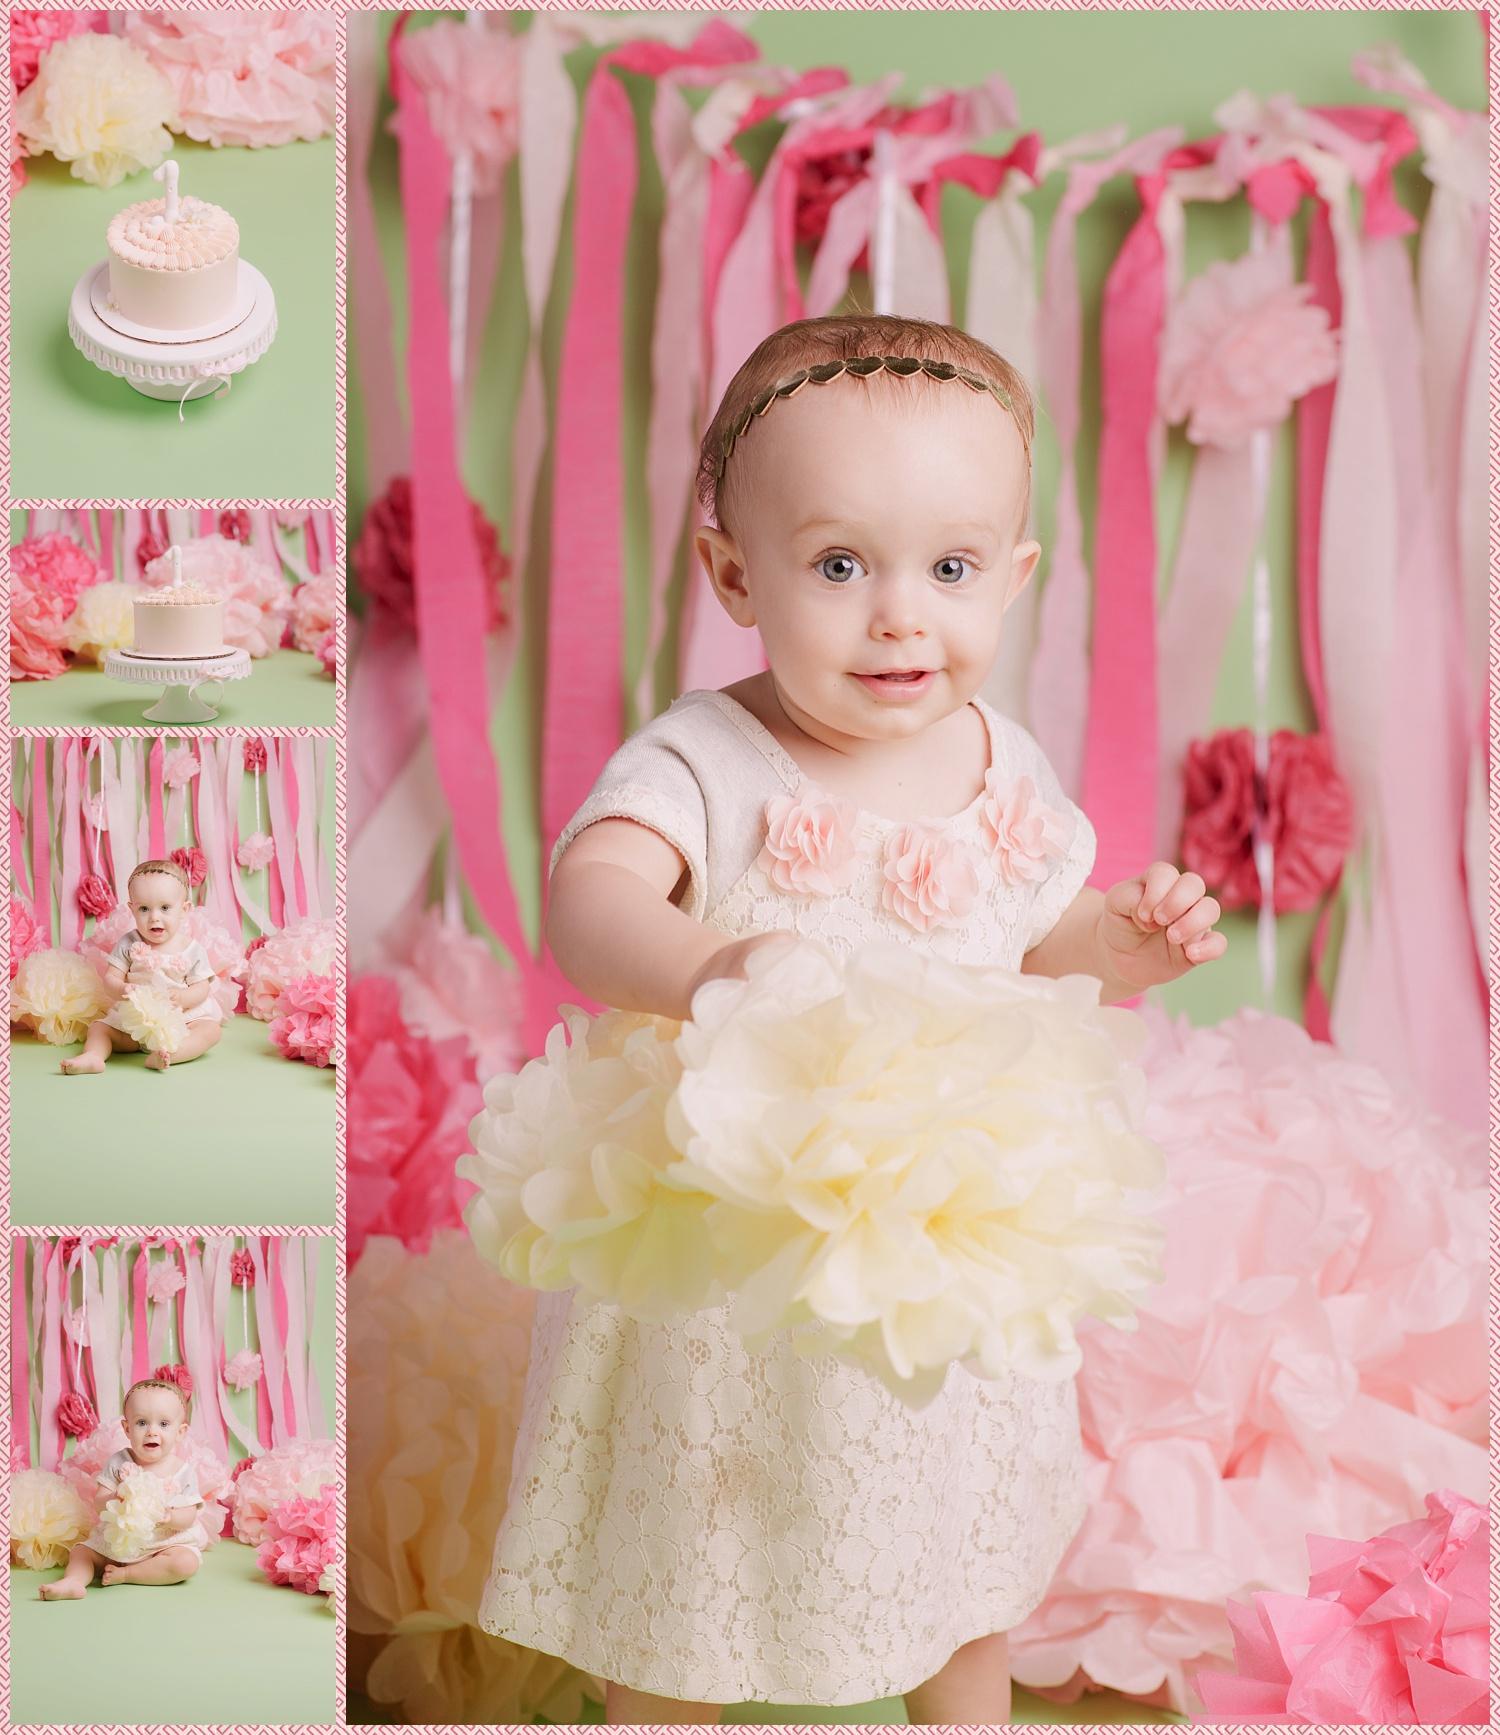 Amy Kristin Photography • Rhode Island Baby Photographer • Cake Smash